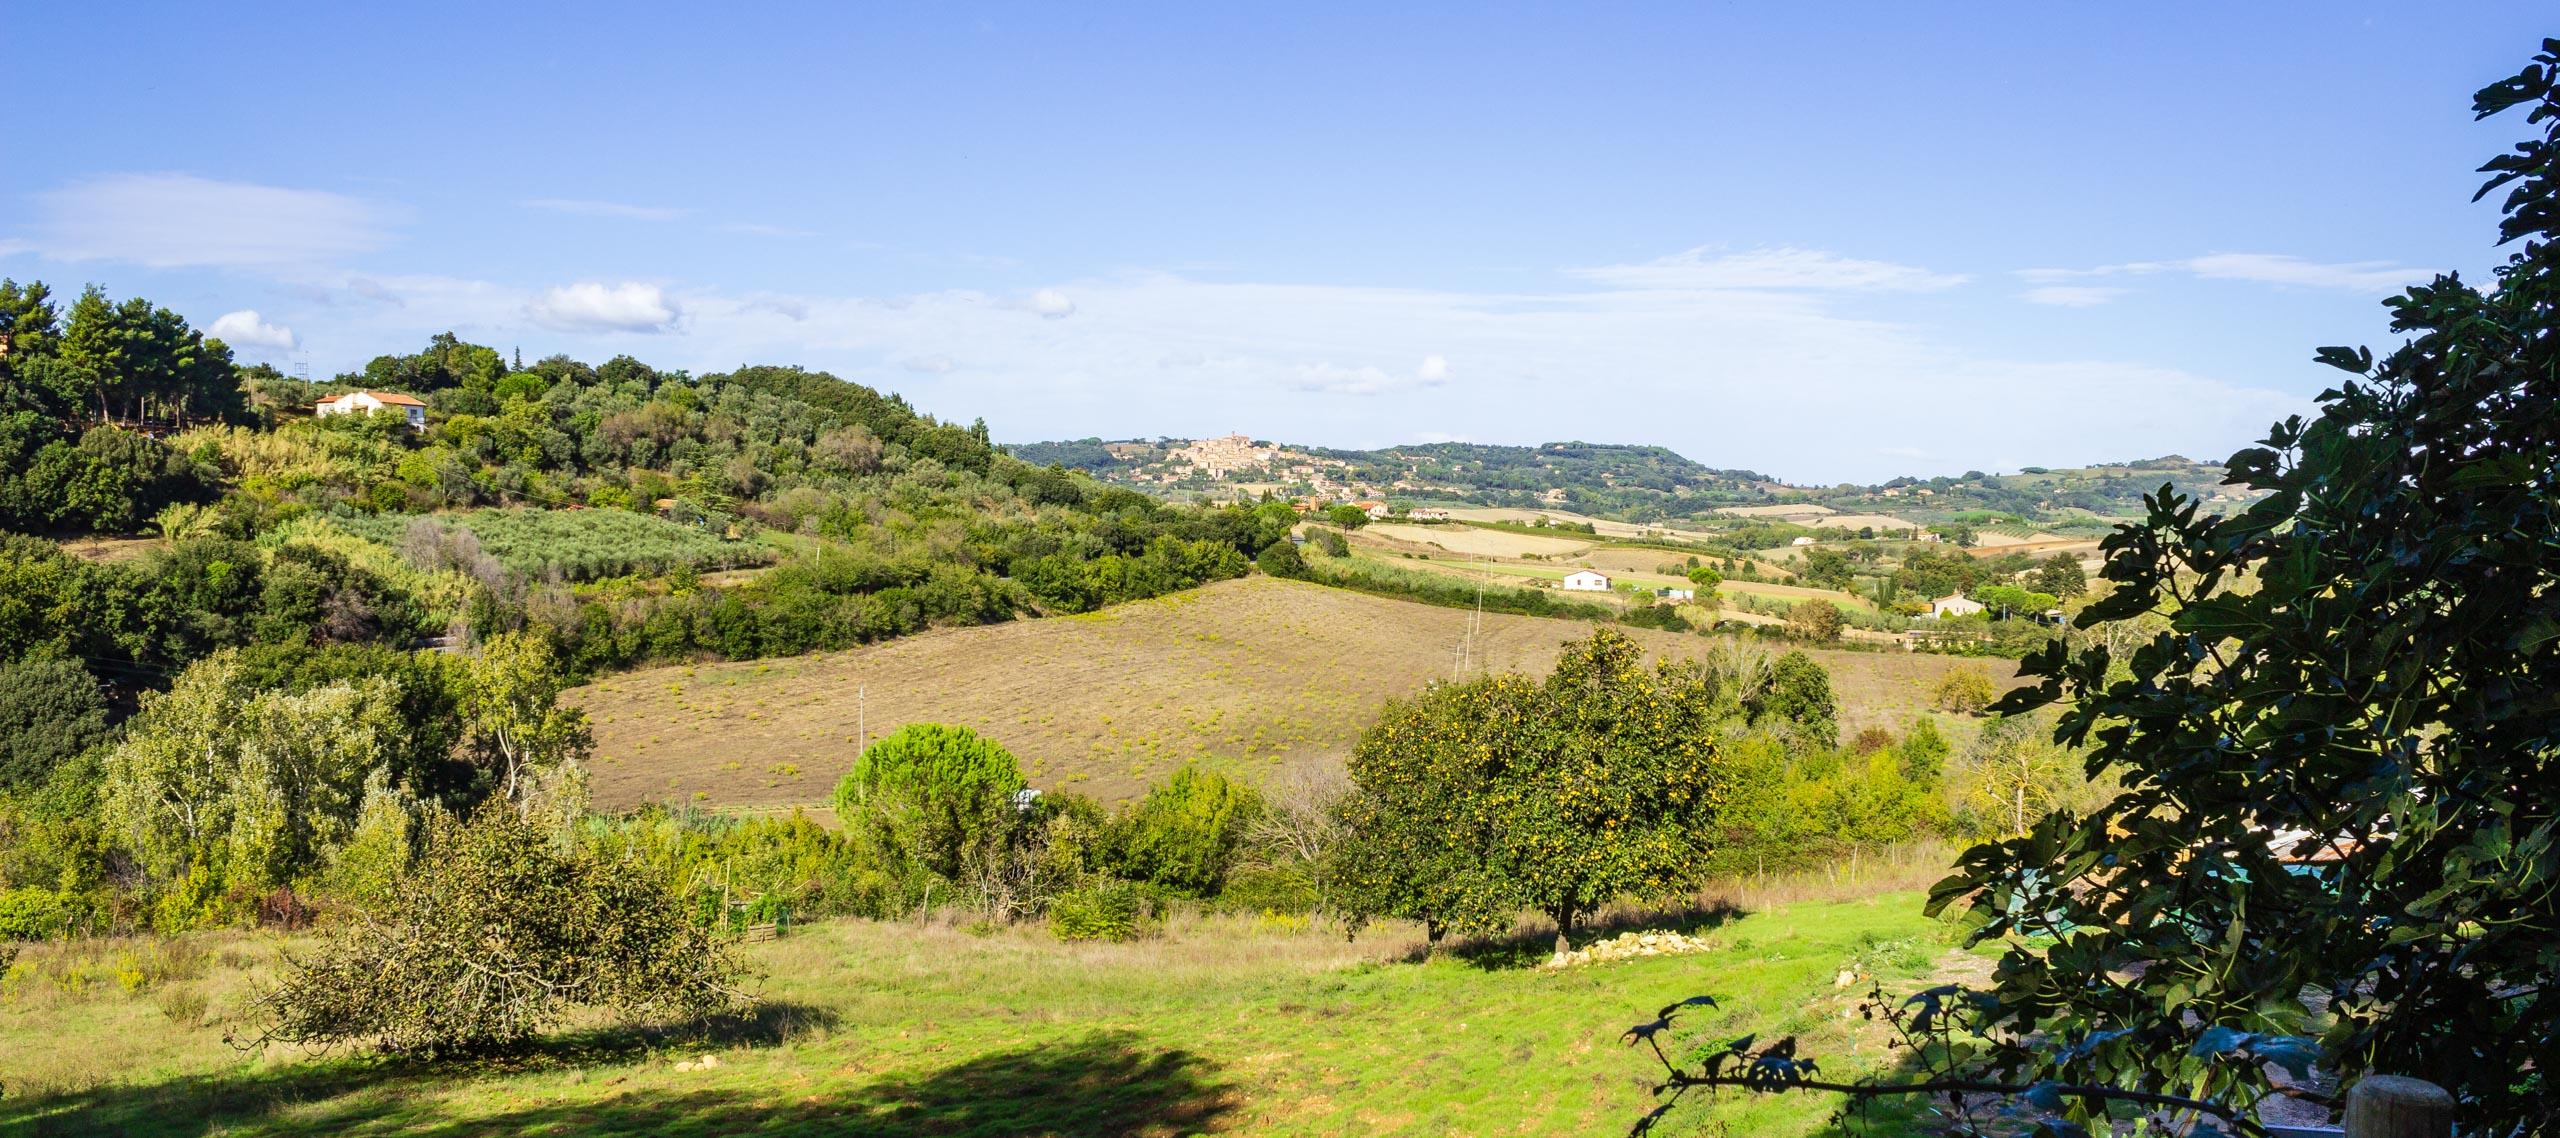 2013 10 Tuscany Panorama 004